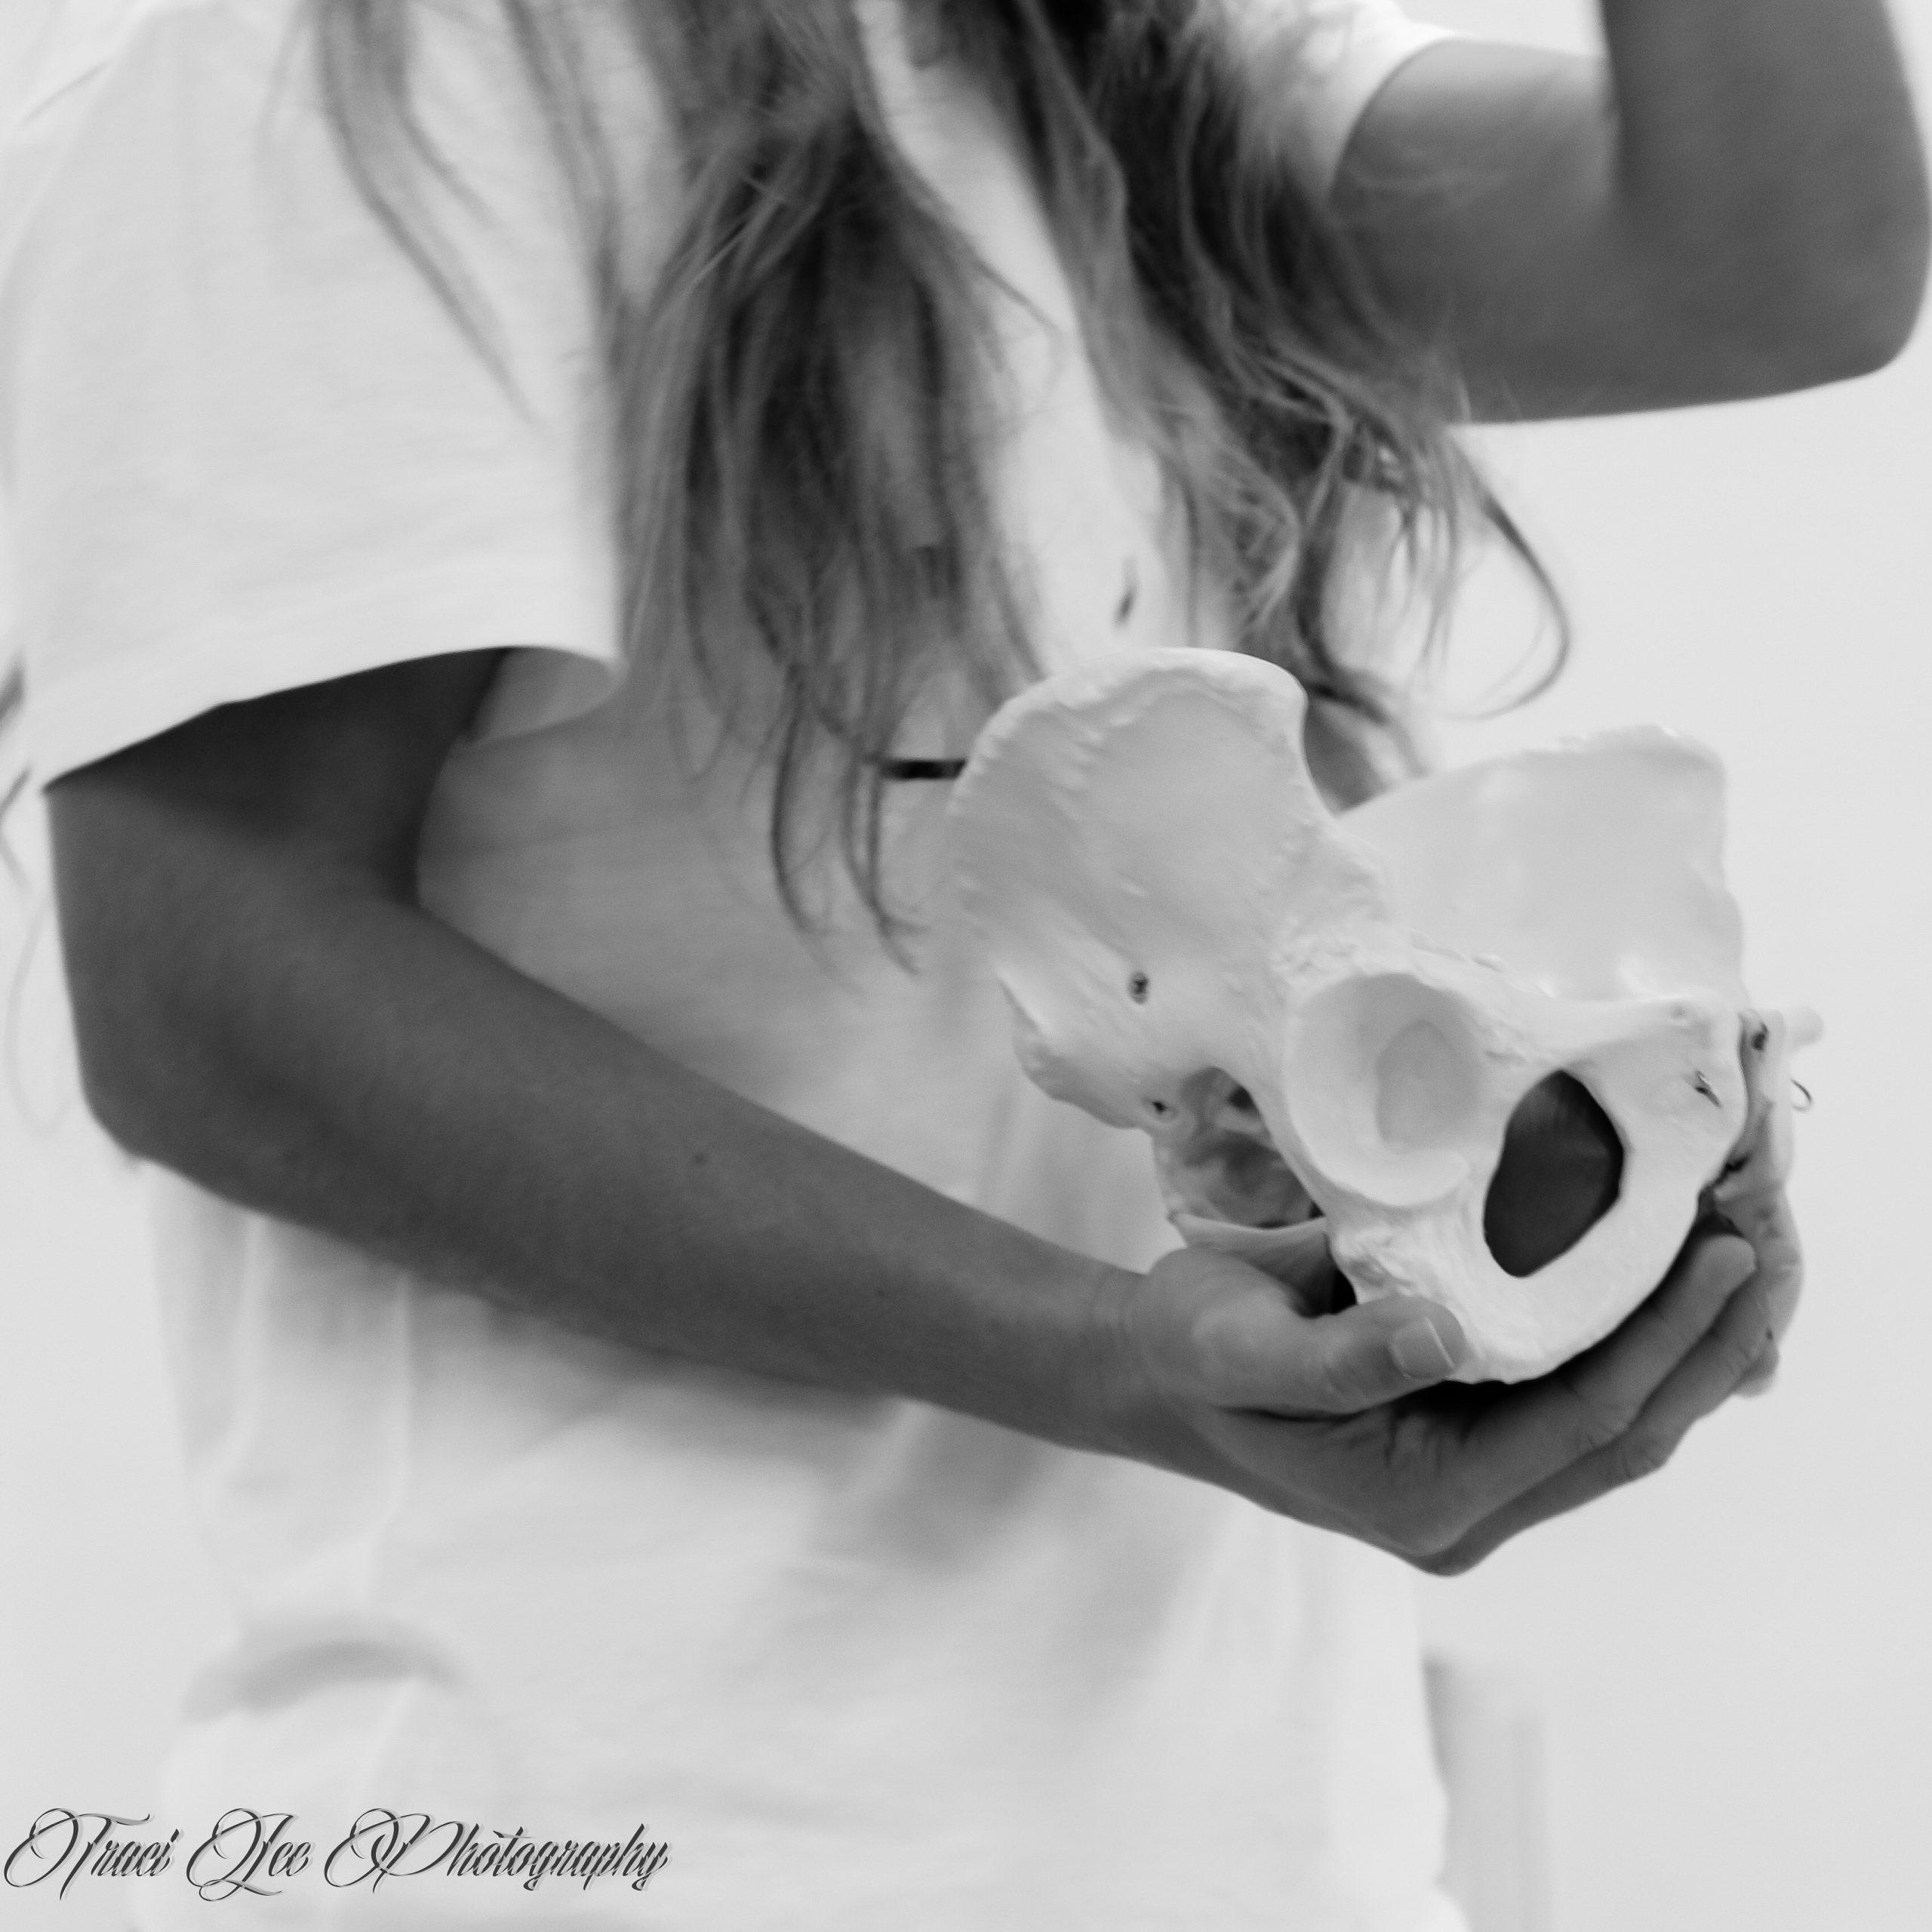 Image of a Woman Holding Pelvic Skeleton